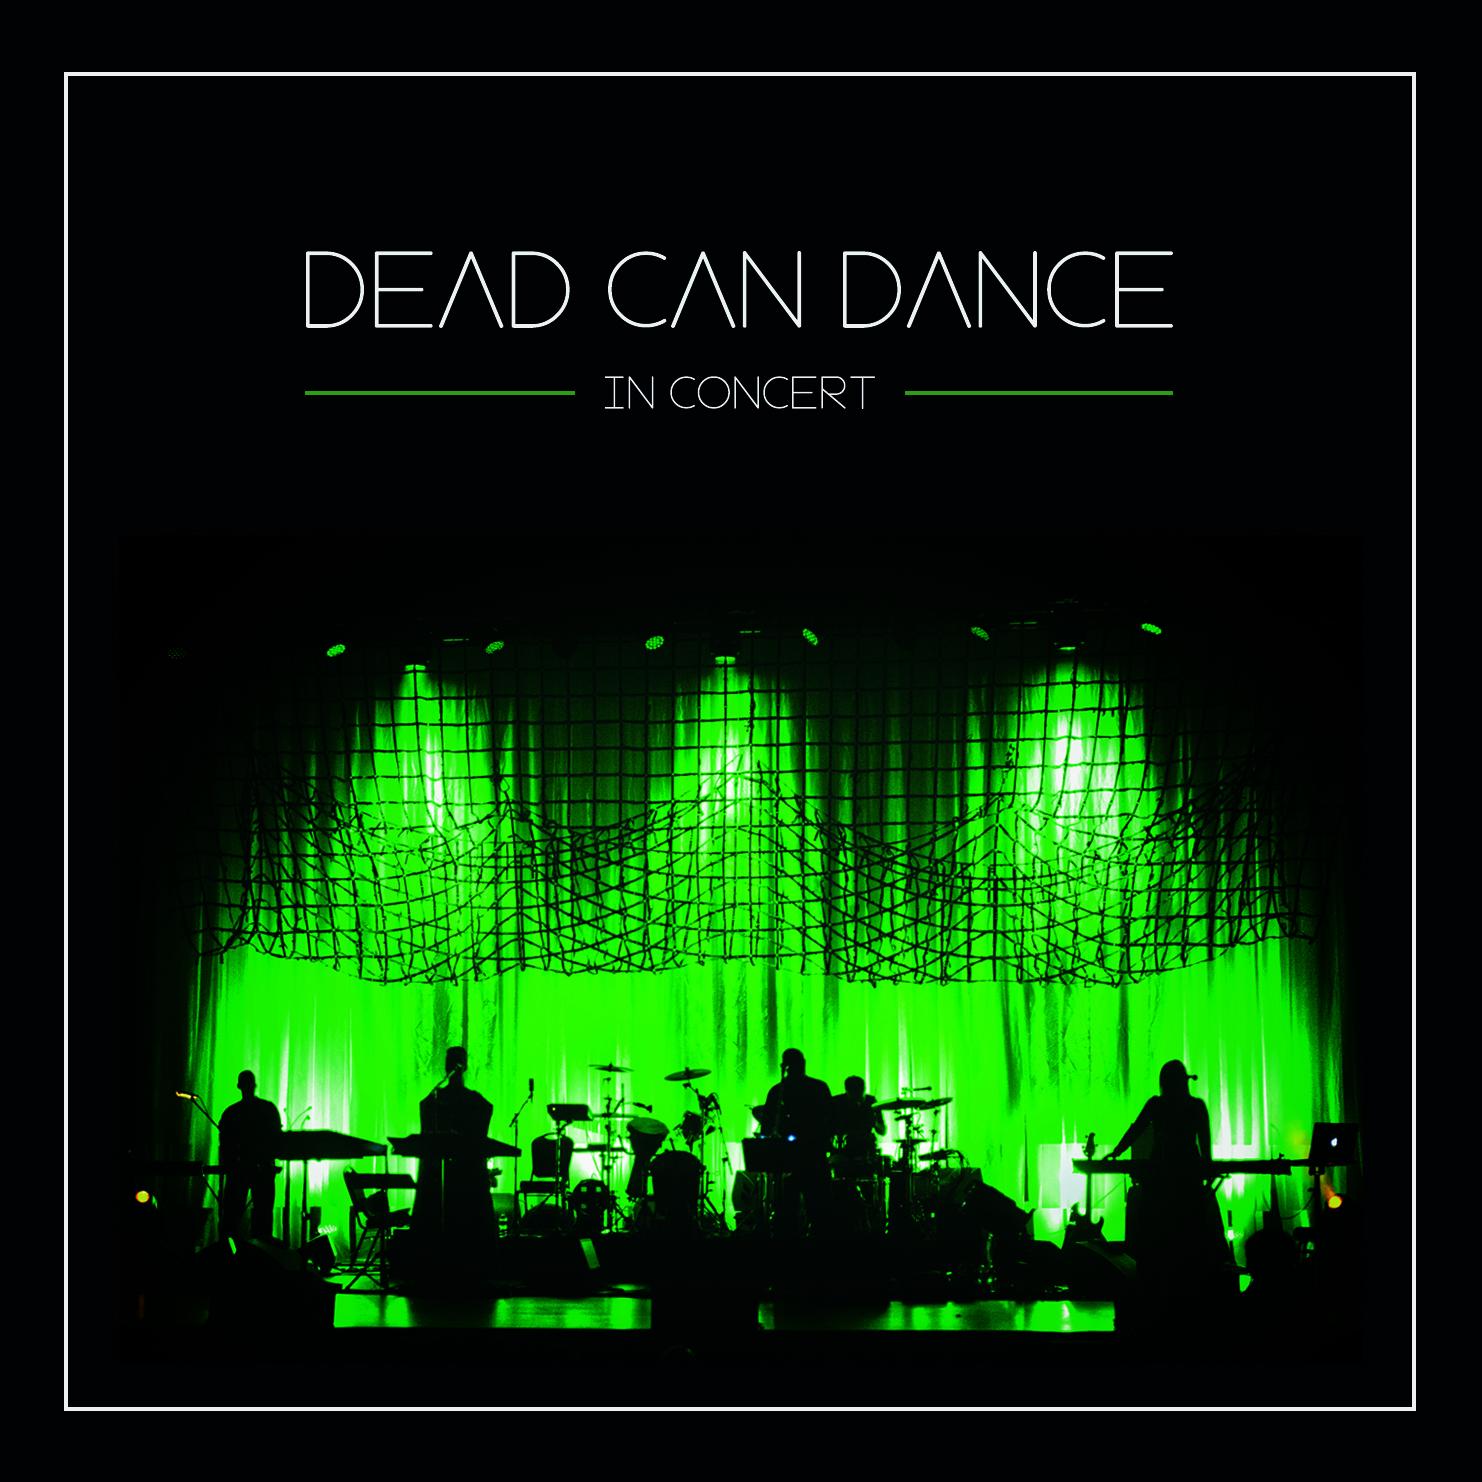 CD Review : Dead Can Dance - In Concert